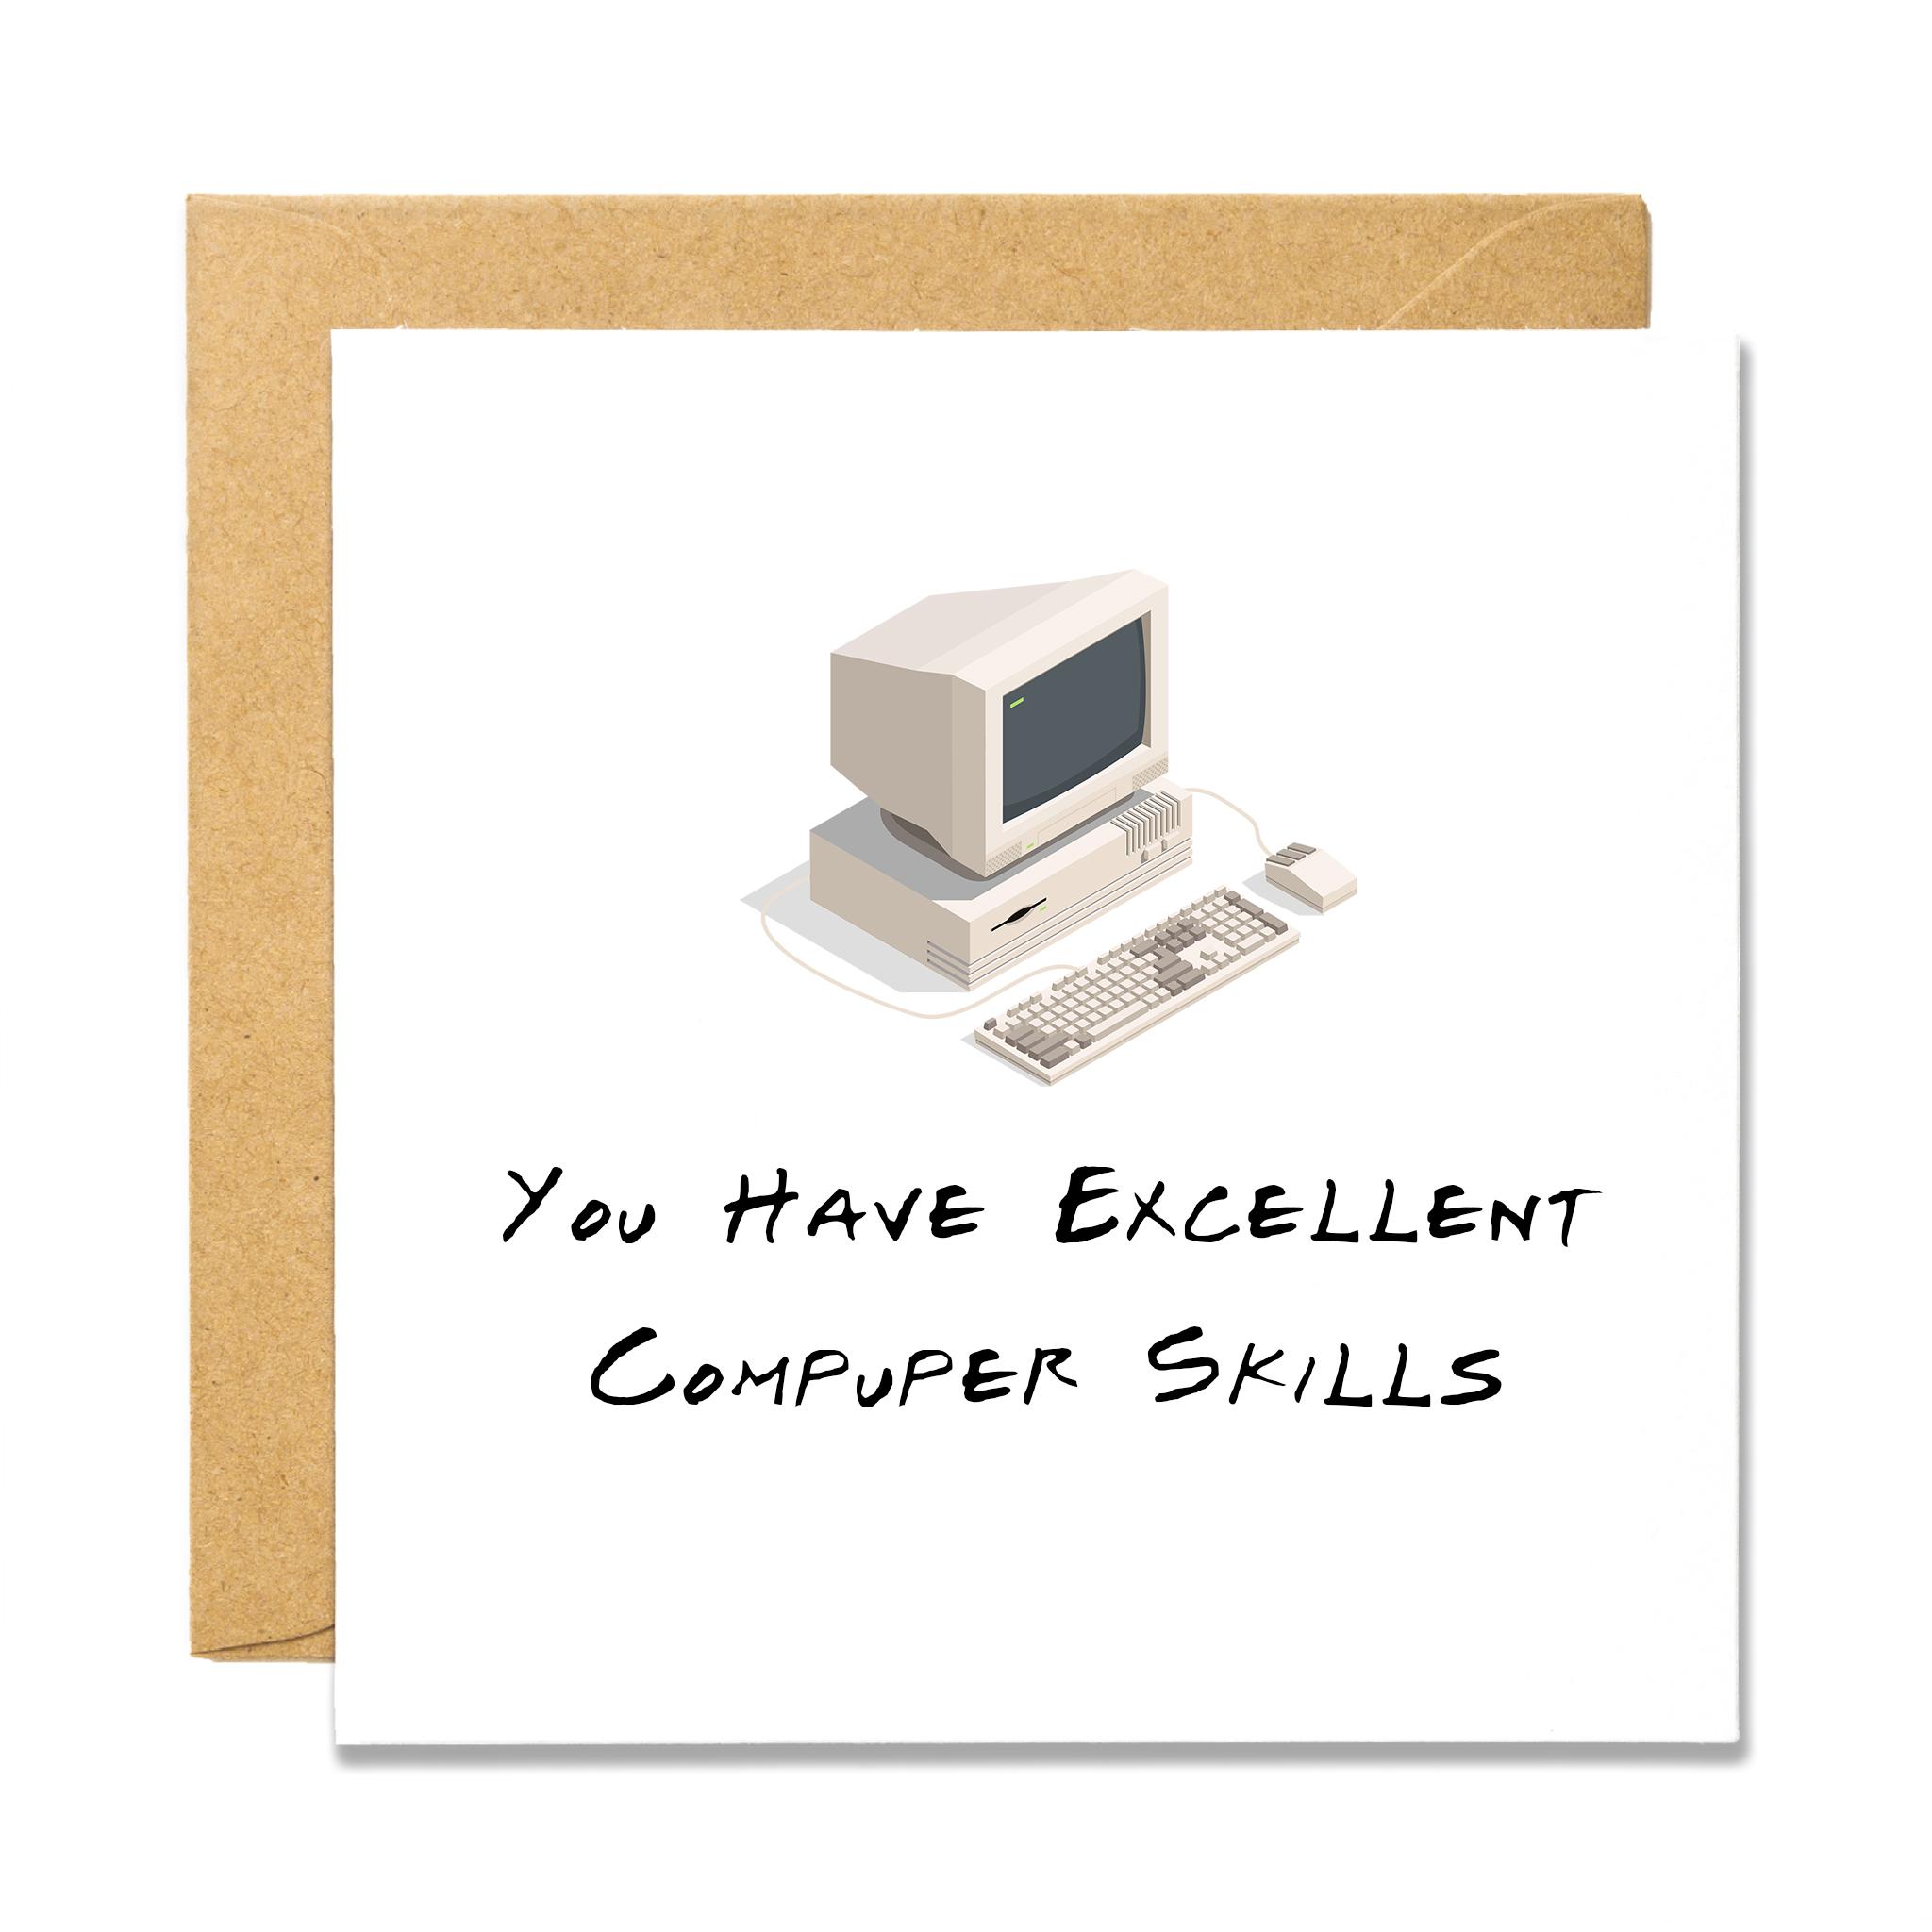 Compuper Skills